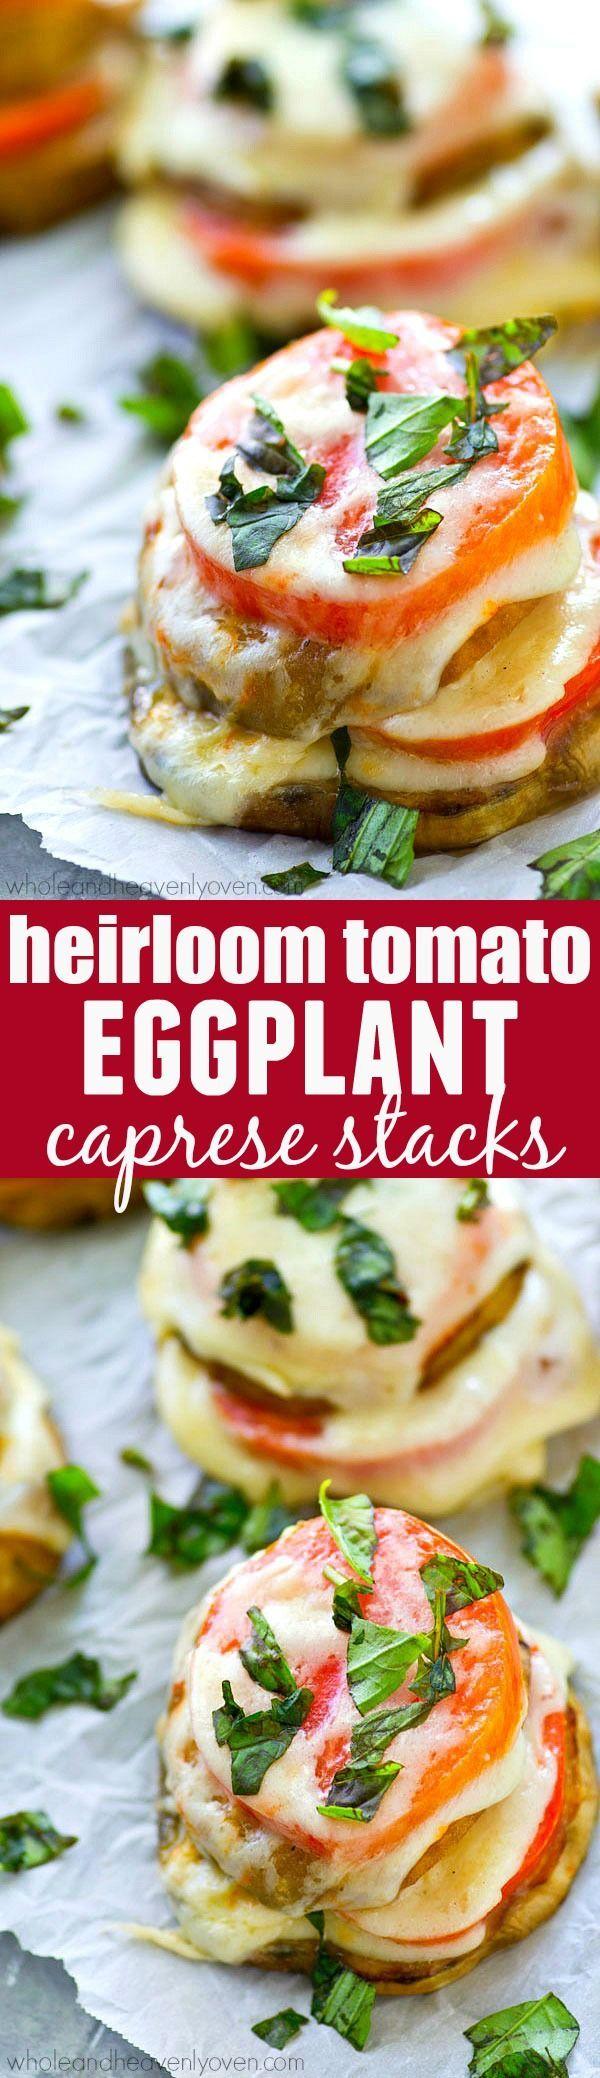 These layered caprese stacks feature fresh heirloom tomatoes, eggplant, and… (Baking Eggplant Stacks)